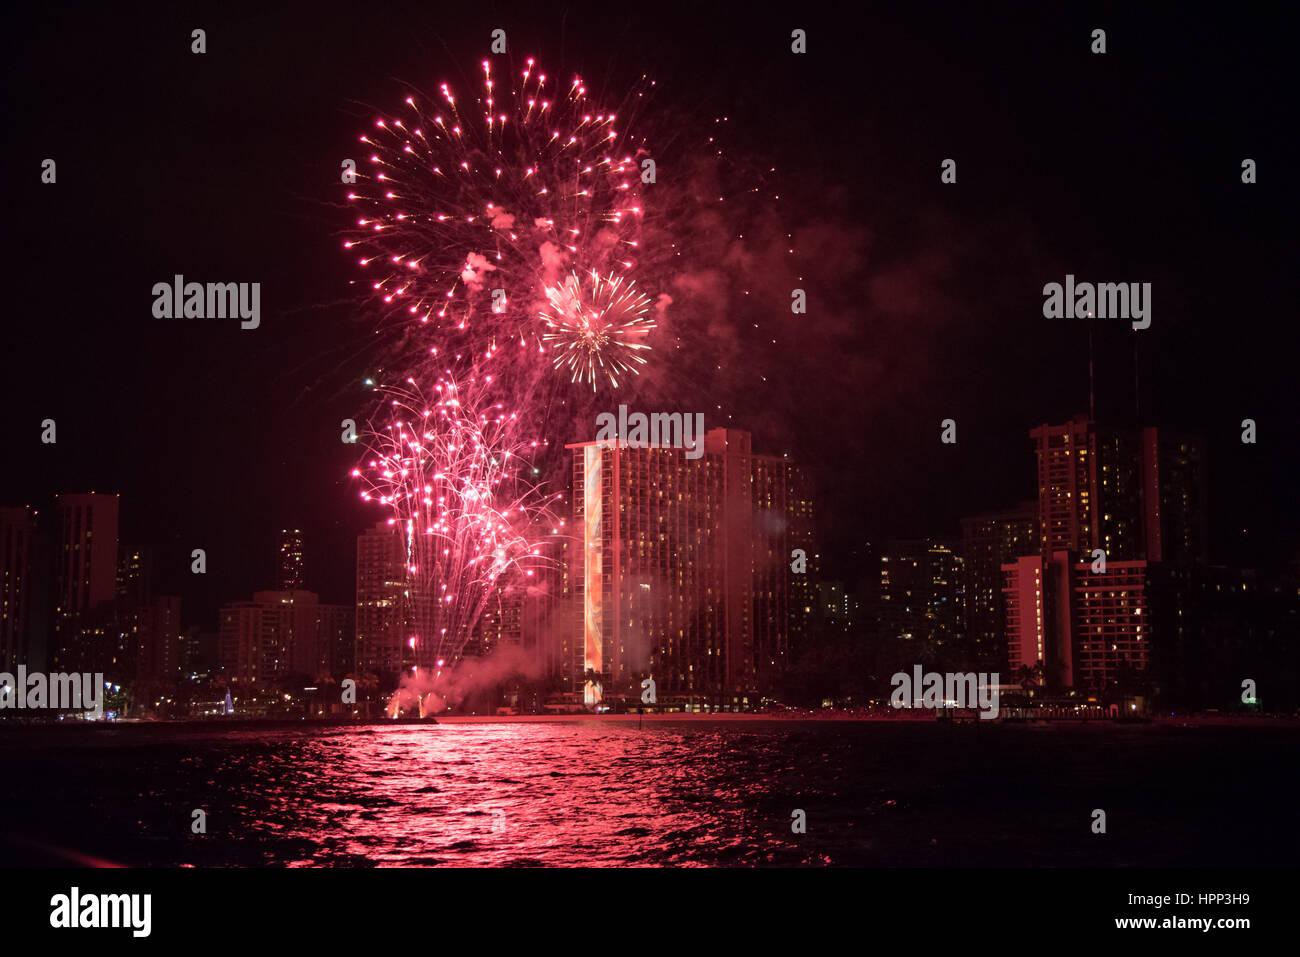 Fireworks At The Waikiki Beach Oahu Hawaii Stock Photo Alamy